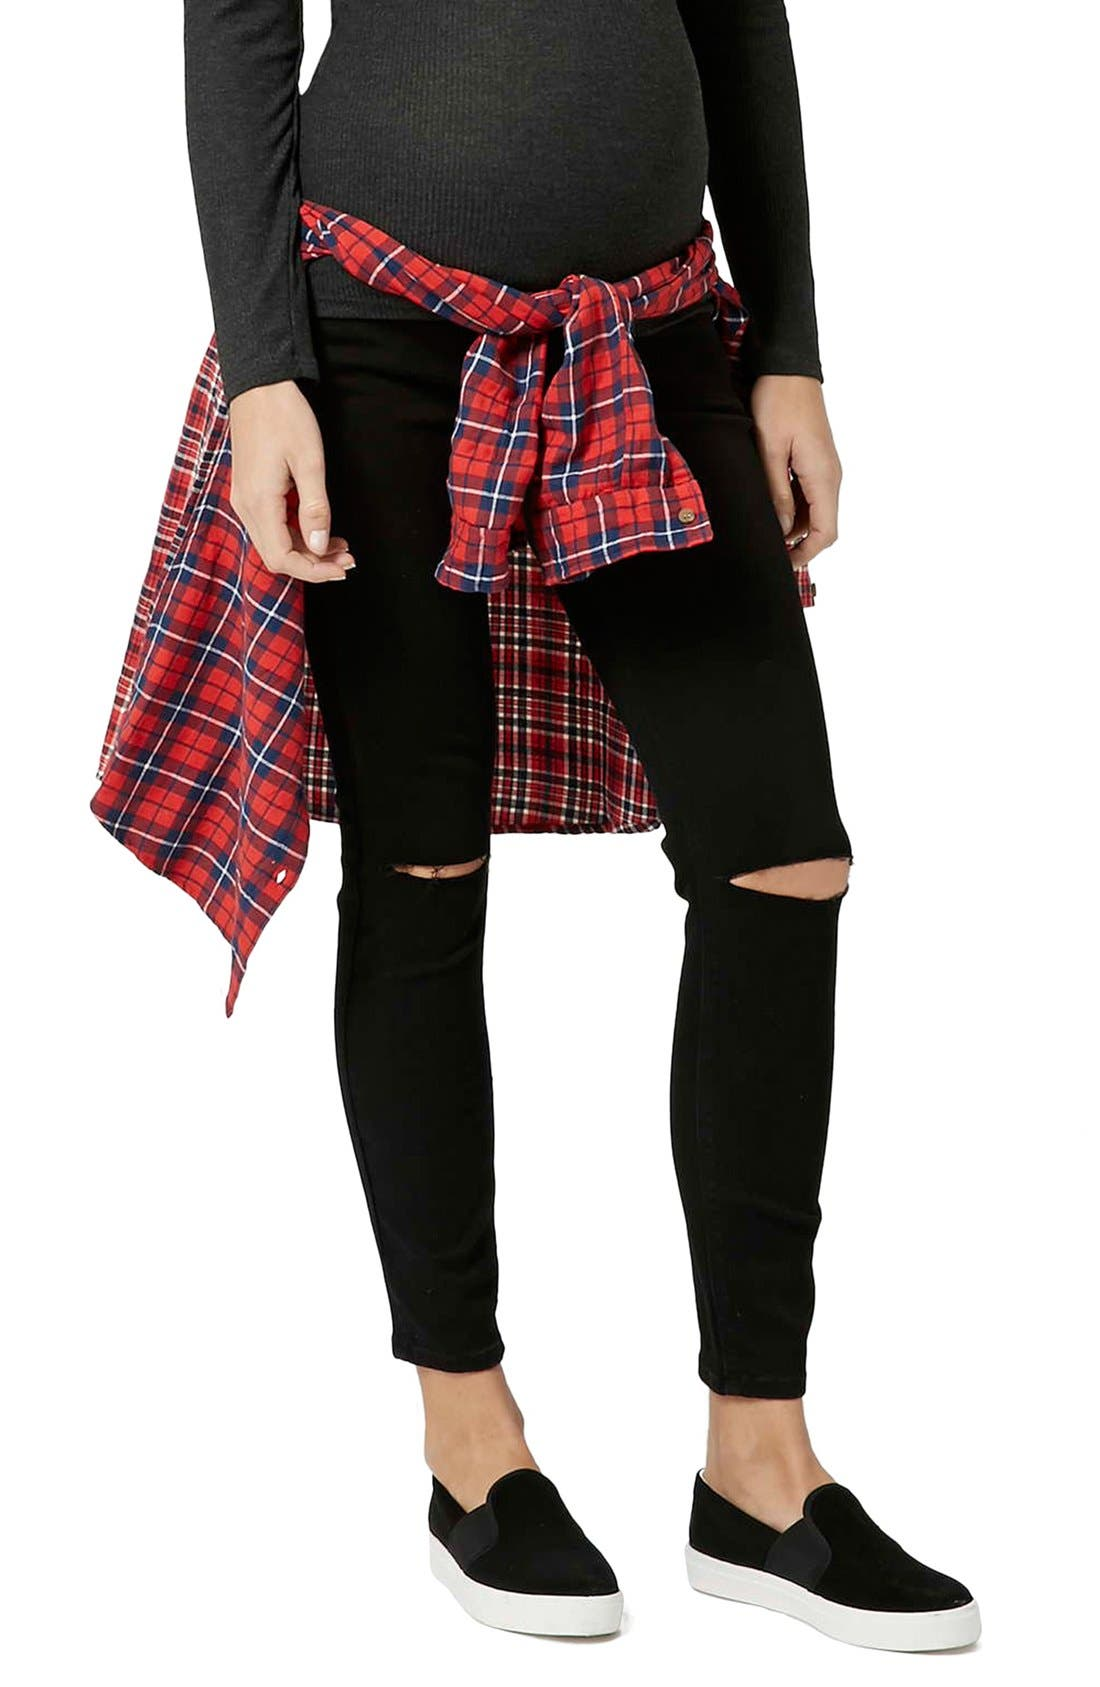 Alternate Image 1 Selected - Topshop 'Jamie' Ripped Skinny Maternity Jeans